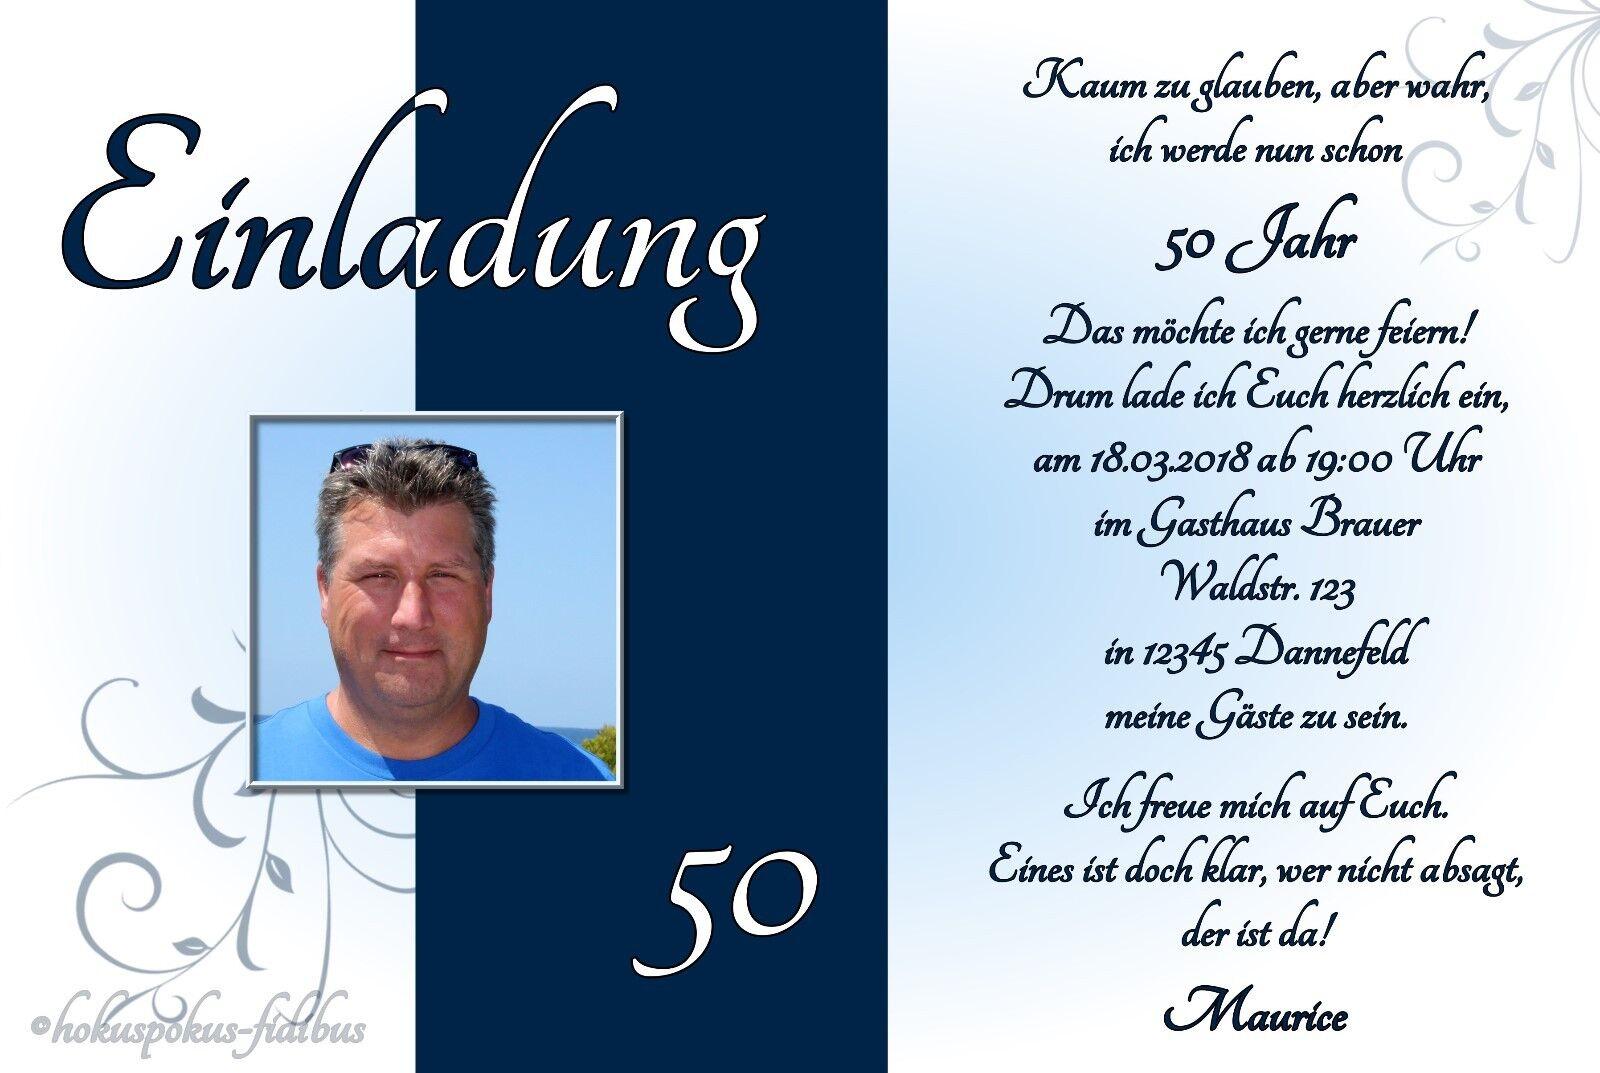 50 Cartes Invitation Anniversaire Invitations situer Chaque age  30 40 50 60 70